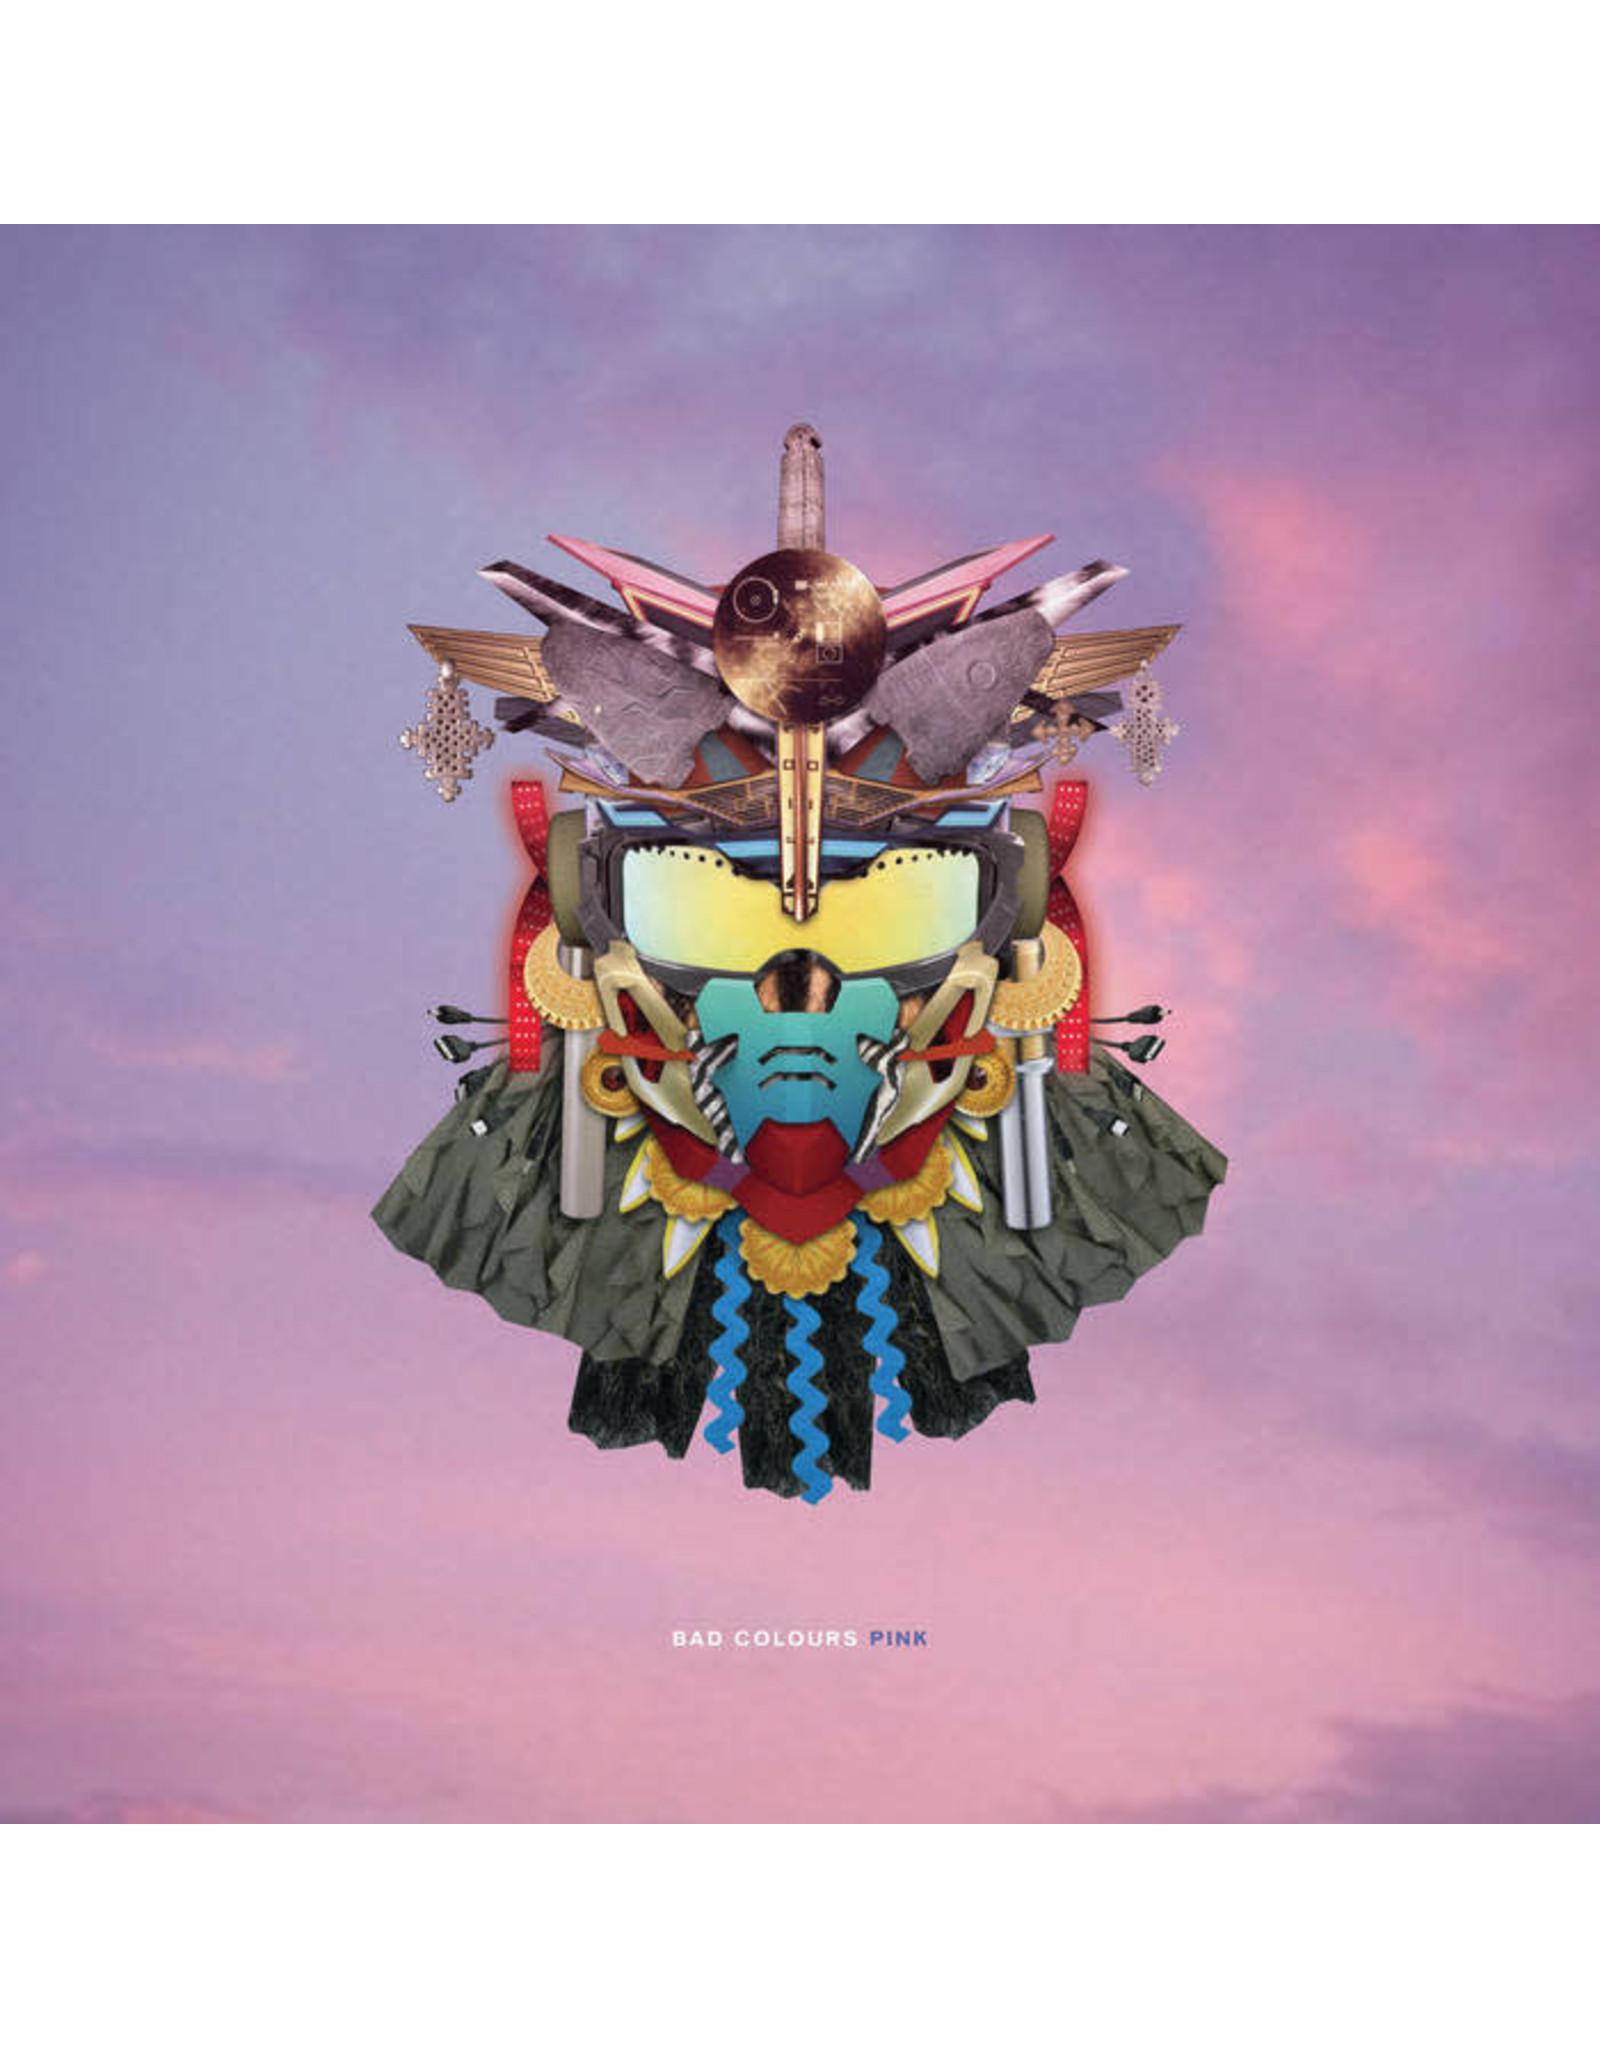 New Vinyl Bad Colours - PINK LP